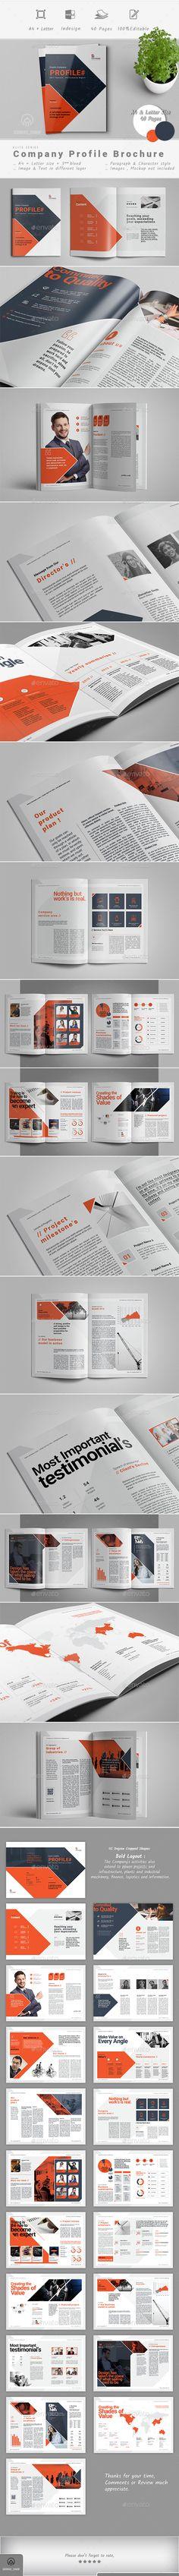 #Company #Profile - Corporate #Brochures Download here: https://graphicriver.net/item/company-profile/19300562?ref=alena994